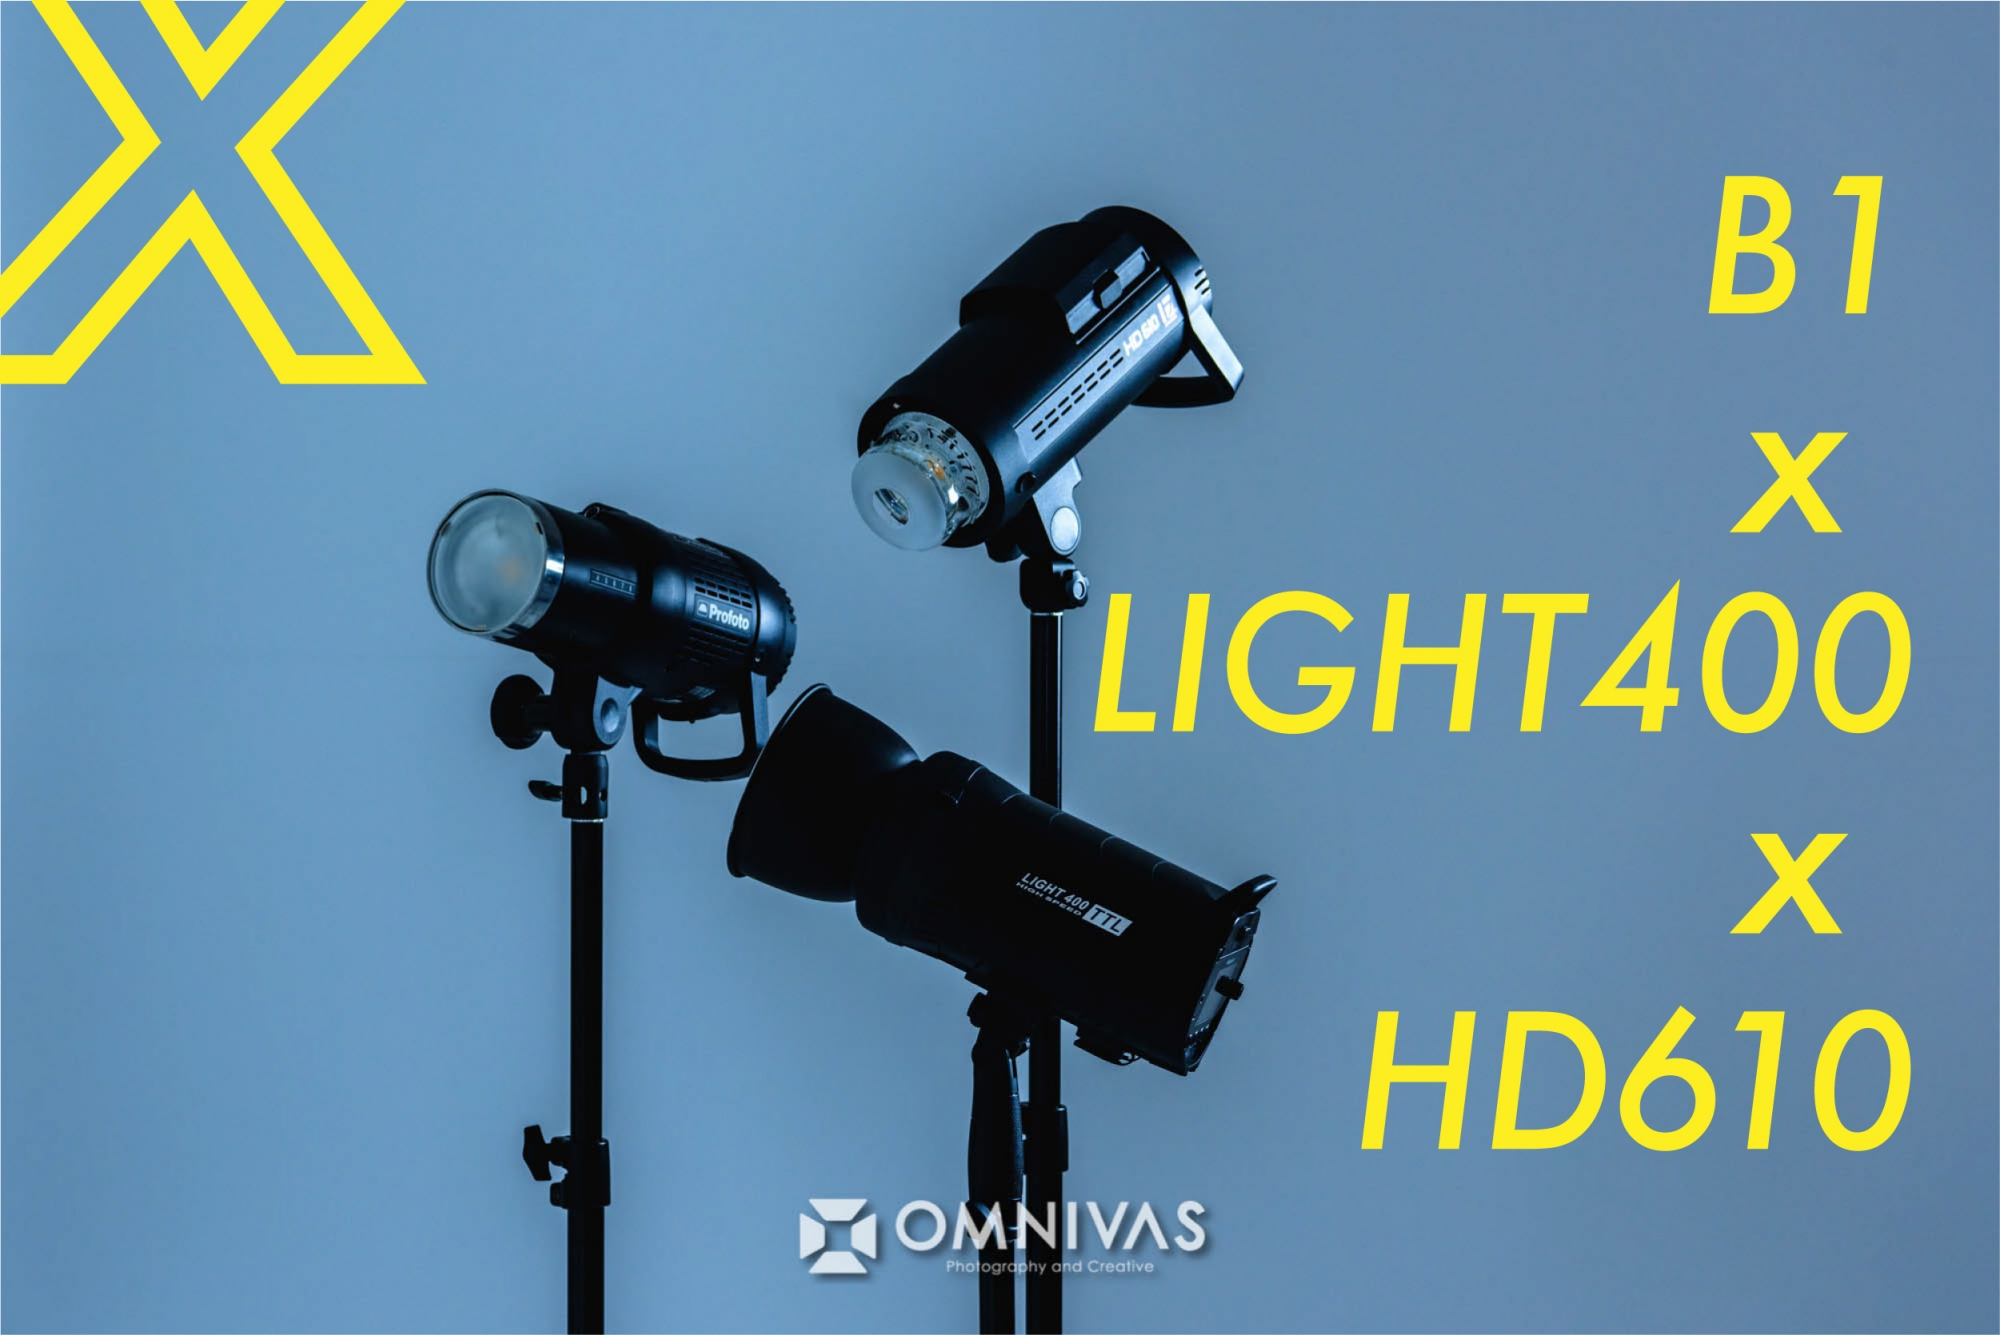 【ProfotoB1 vs JINBEI HD610 vs LIGHT400】バッテリーストロボ徹底比較 光質編